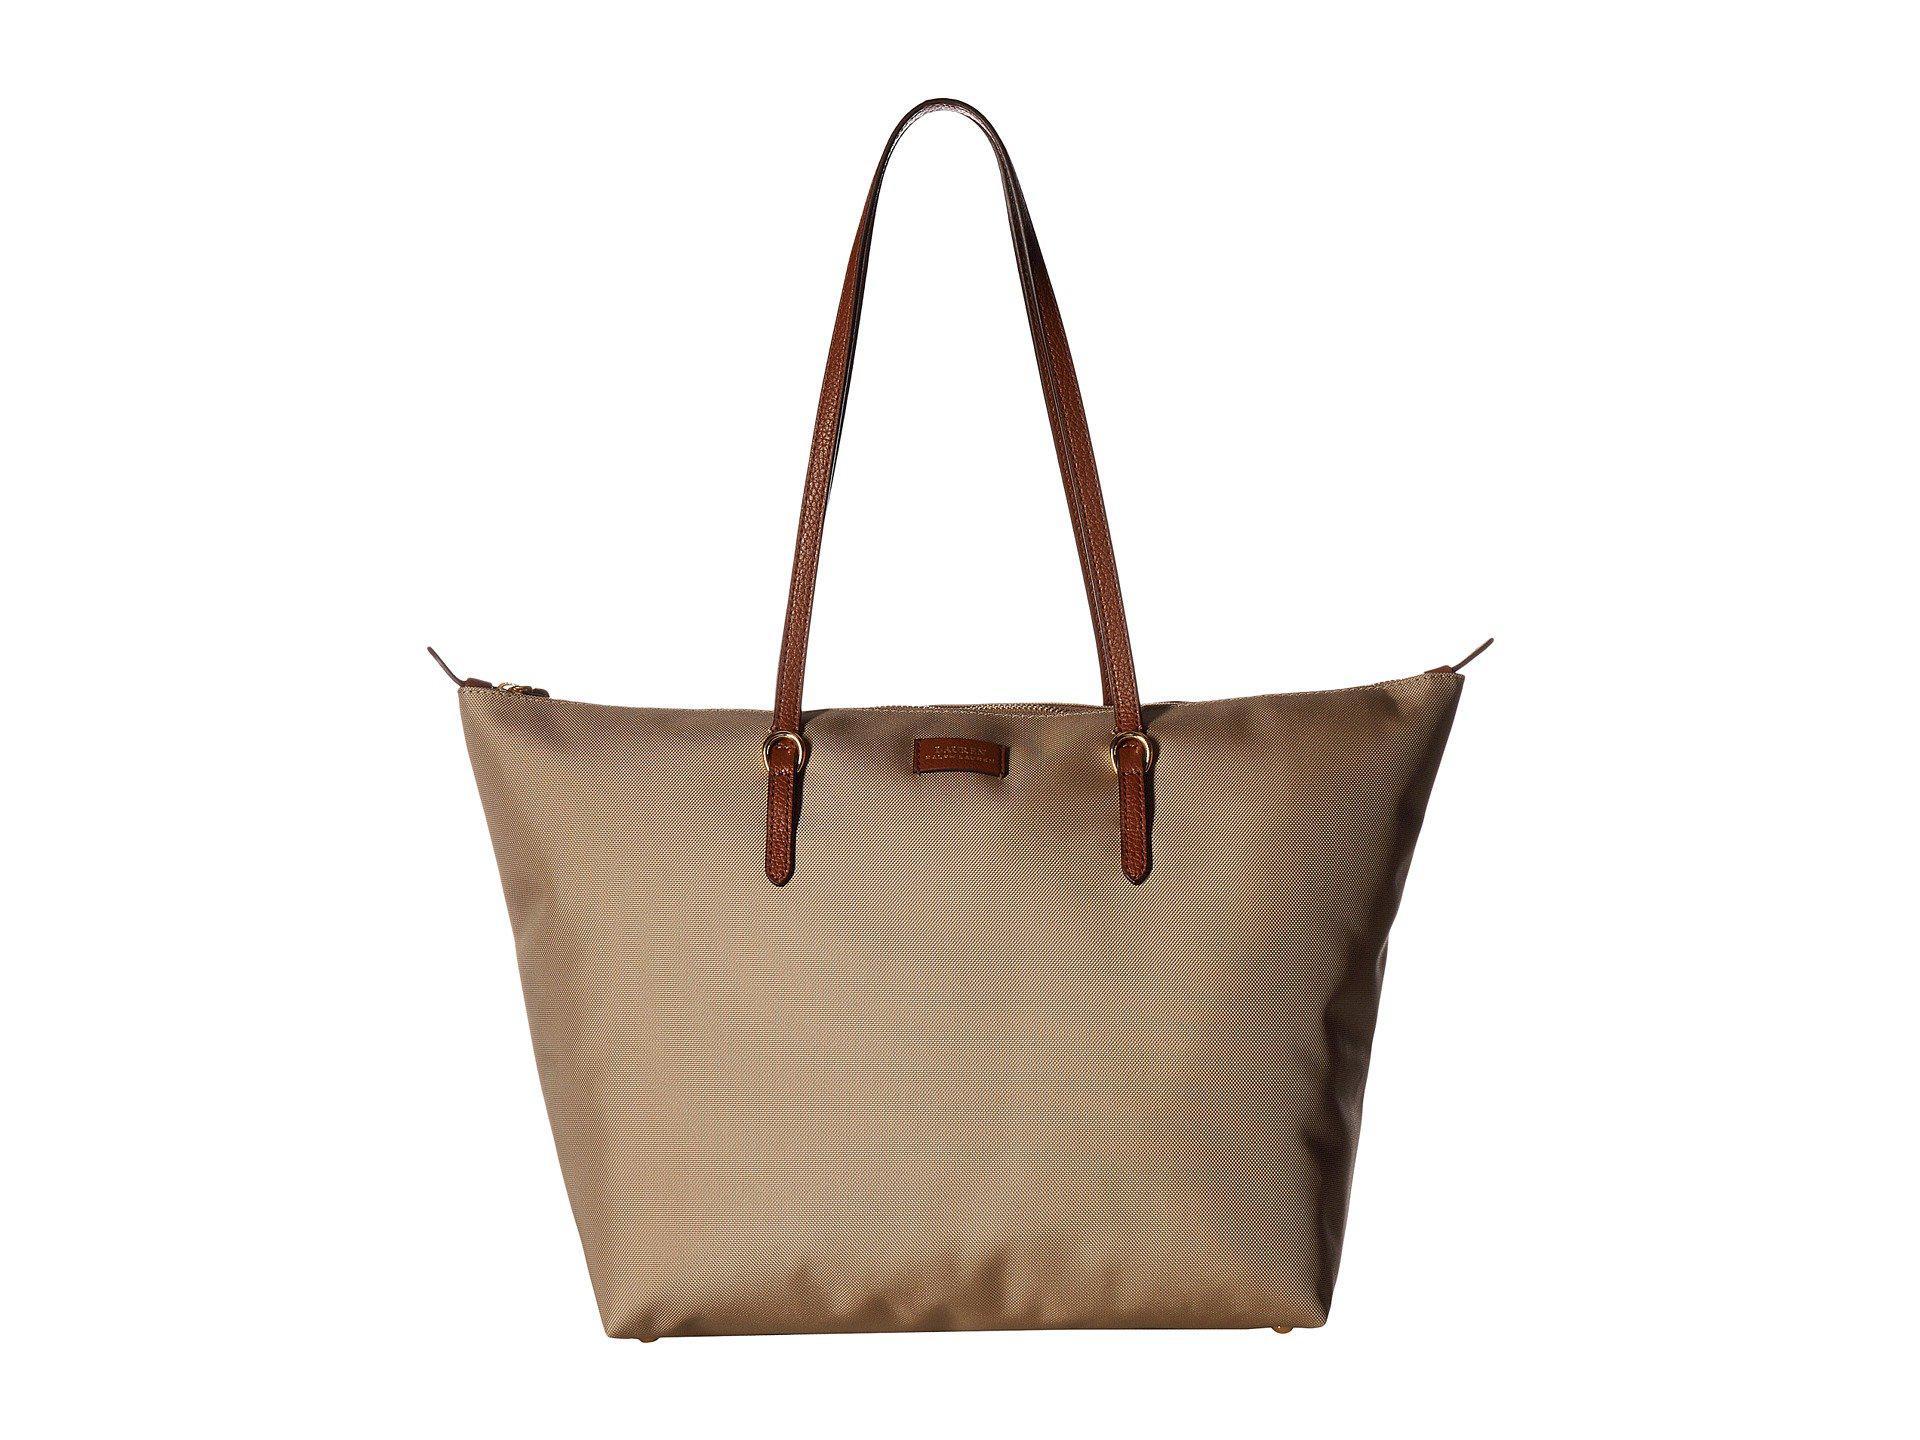 95e295b58a Lauren by Ralph Lauren. Women s Brown Chadwick Tote Medium (black) Tote  Handbags